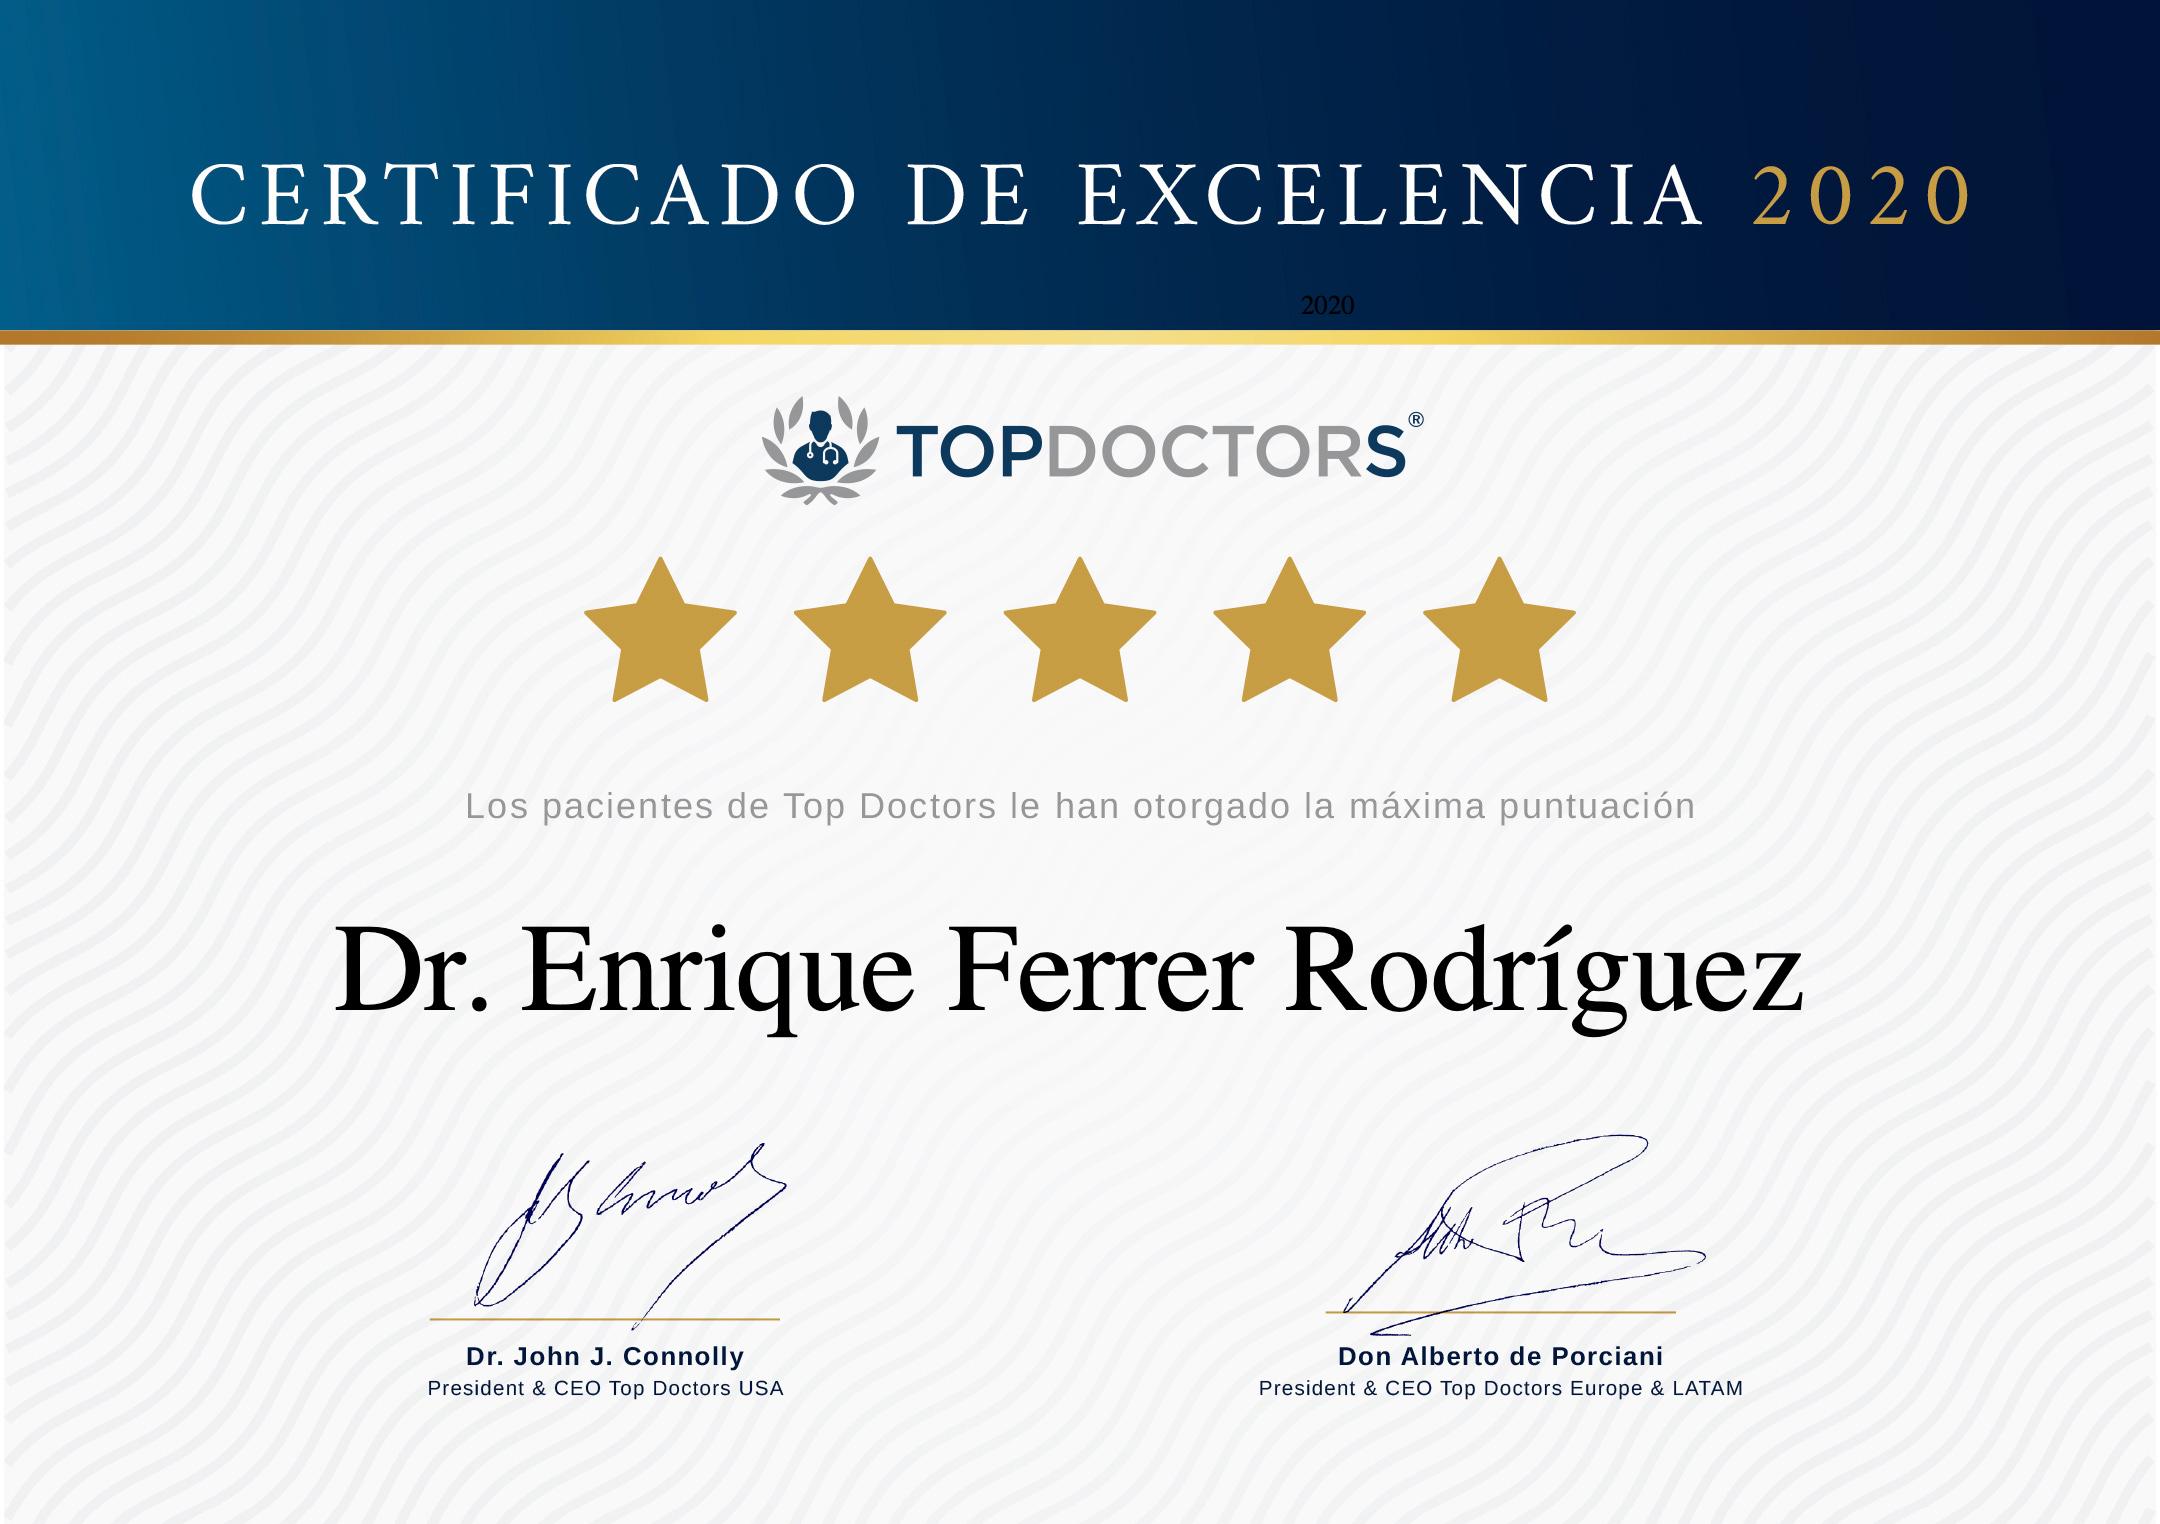 Top doctors excelencia Doctor Enrique Ferrer